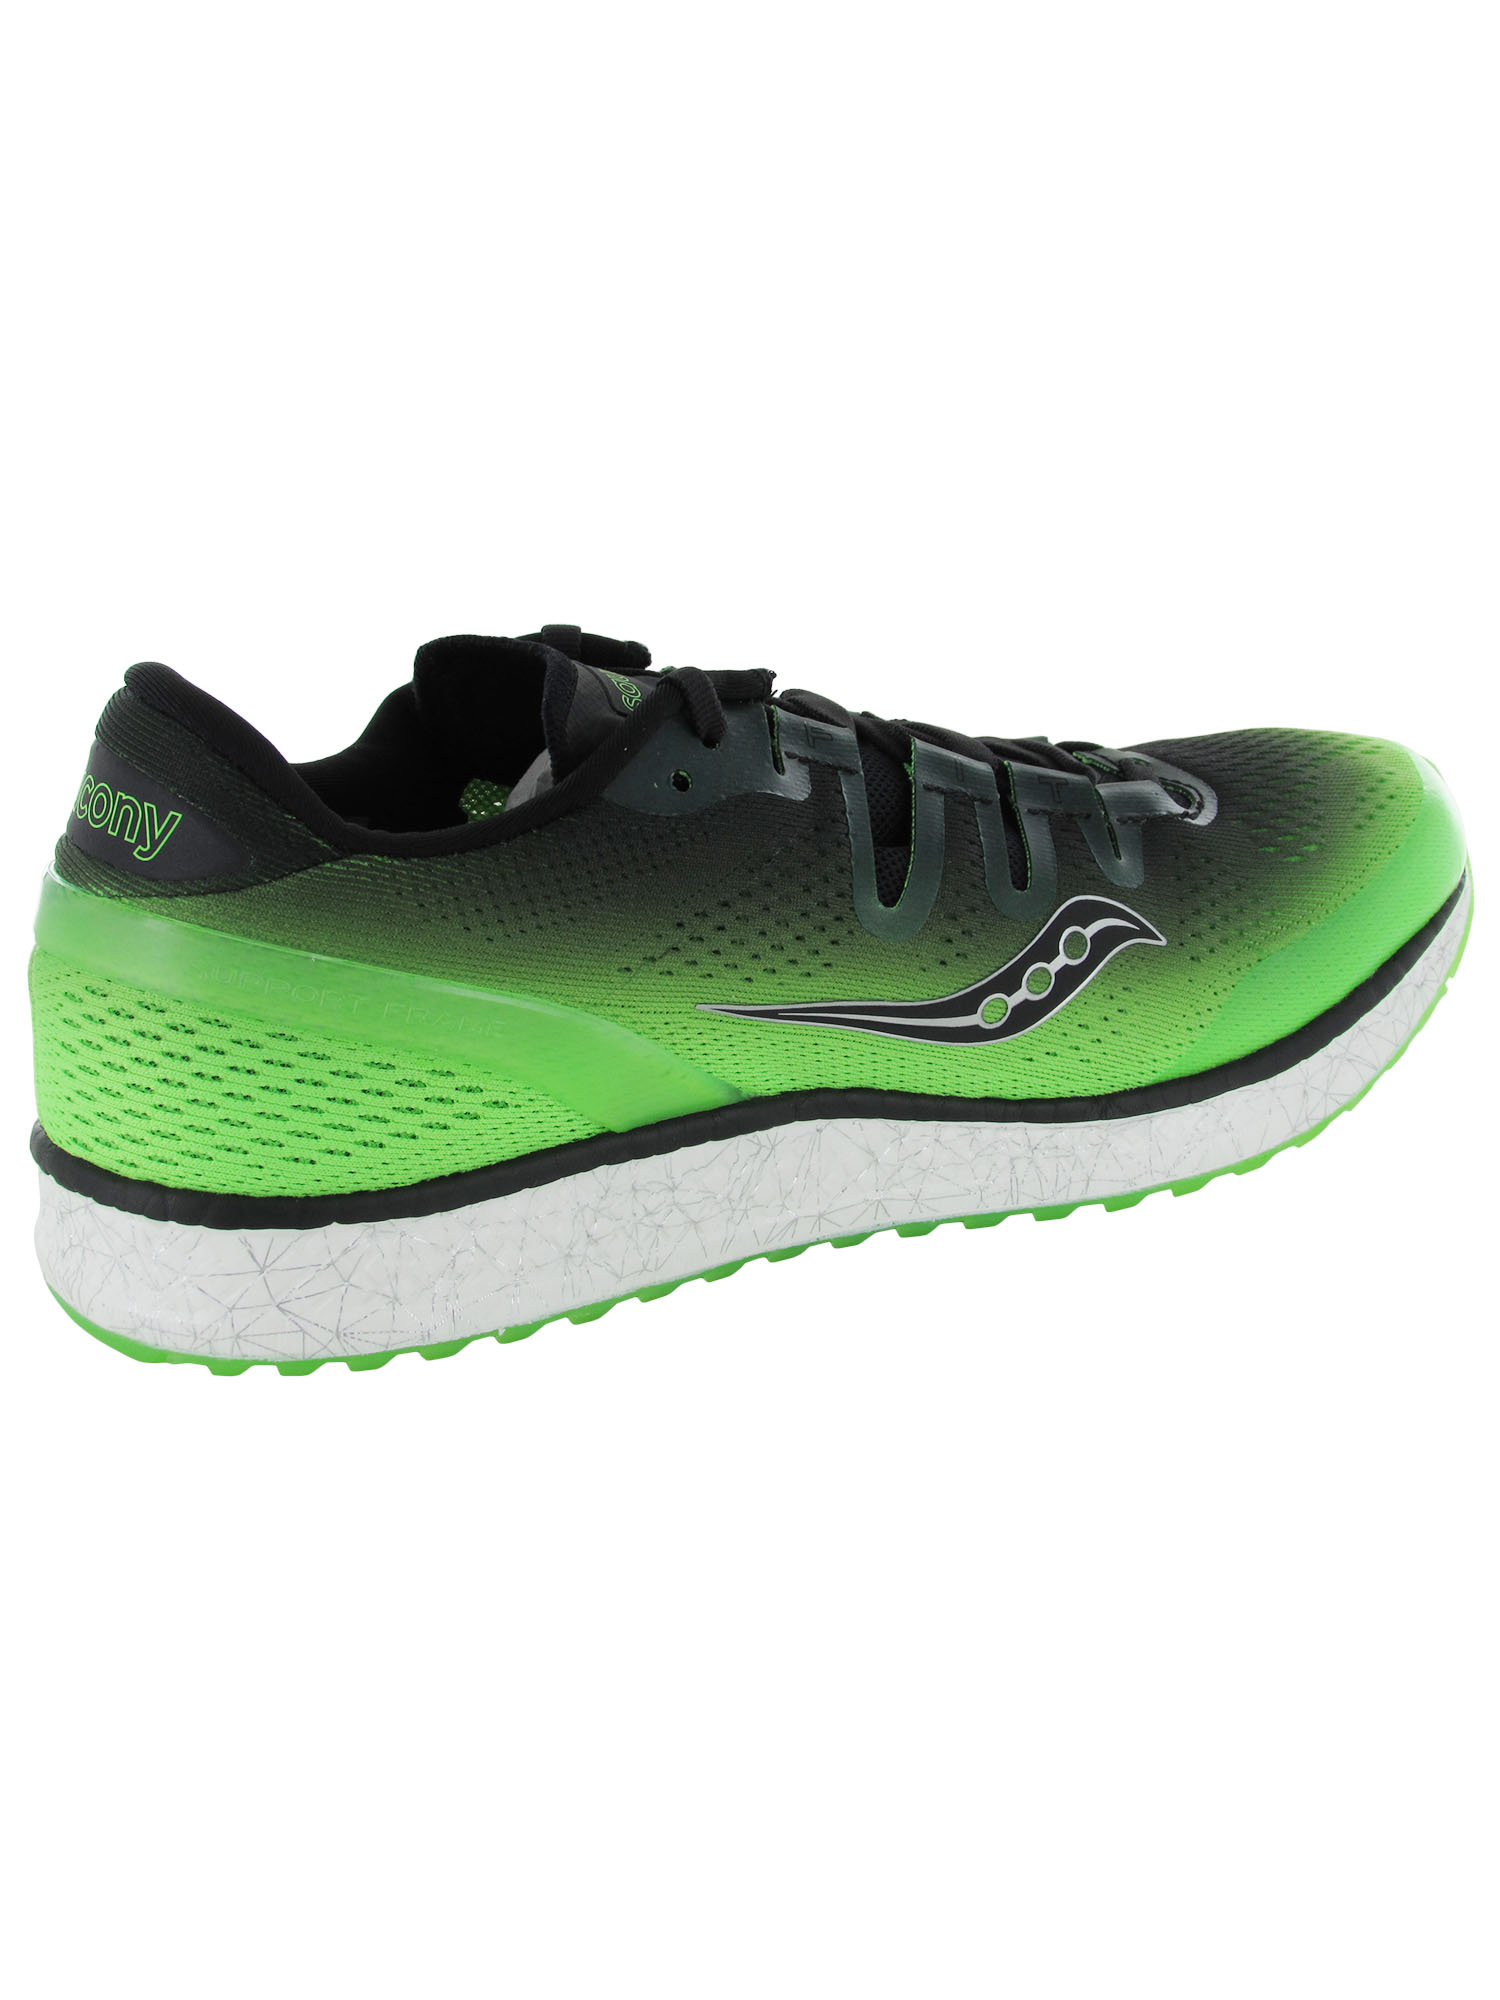 Detalles acerca de Saucony Freedom ISO Correr Zapatillas Zapatos para hombre mostrar título original